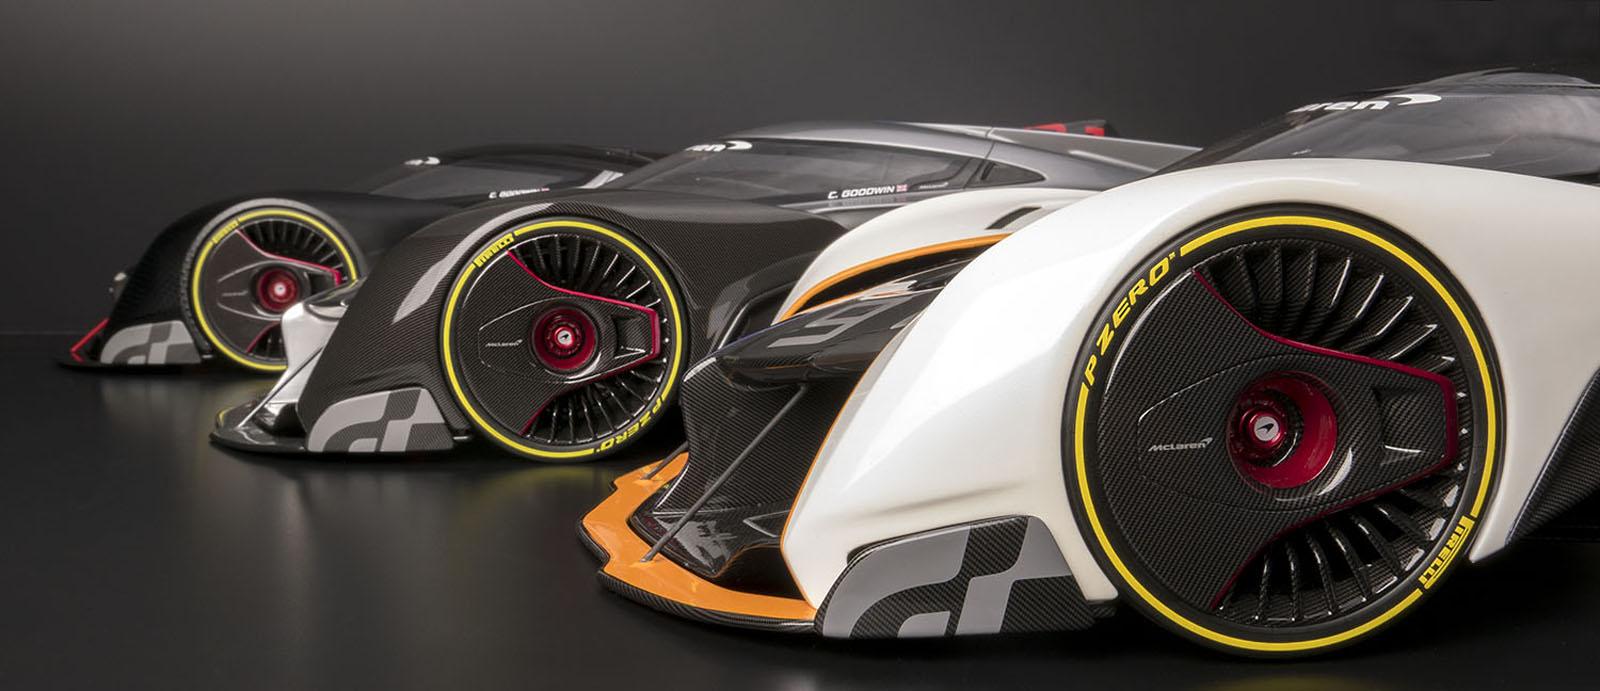 Mclaren P1 Cost >> McLaren Ultimate Vision Gran Turismo Comes To Life In 1:8 Scale